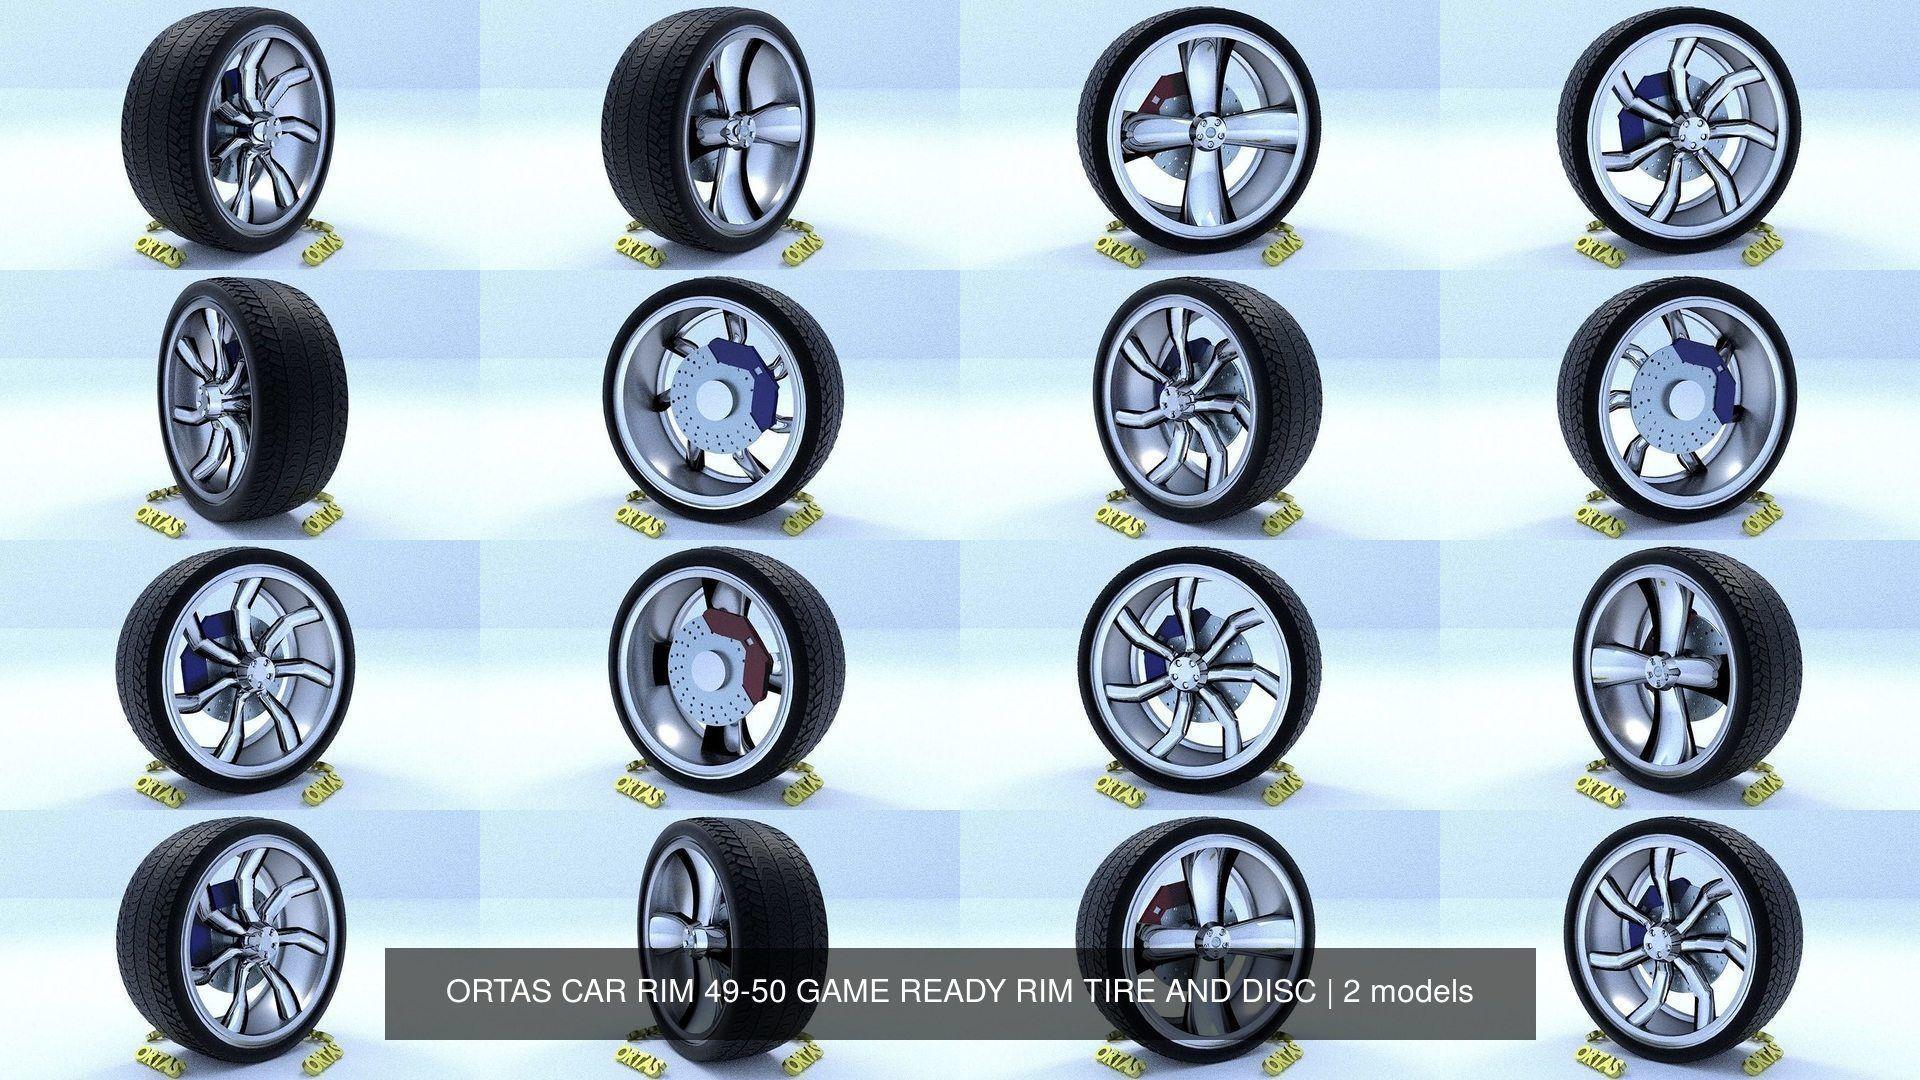 ORTAS CAR RIM 49-50 GAME READY RIM TIRE AND DISC